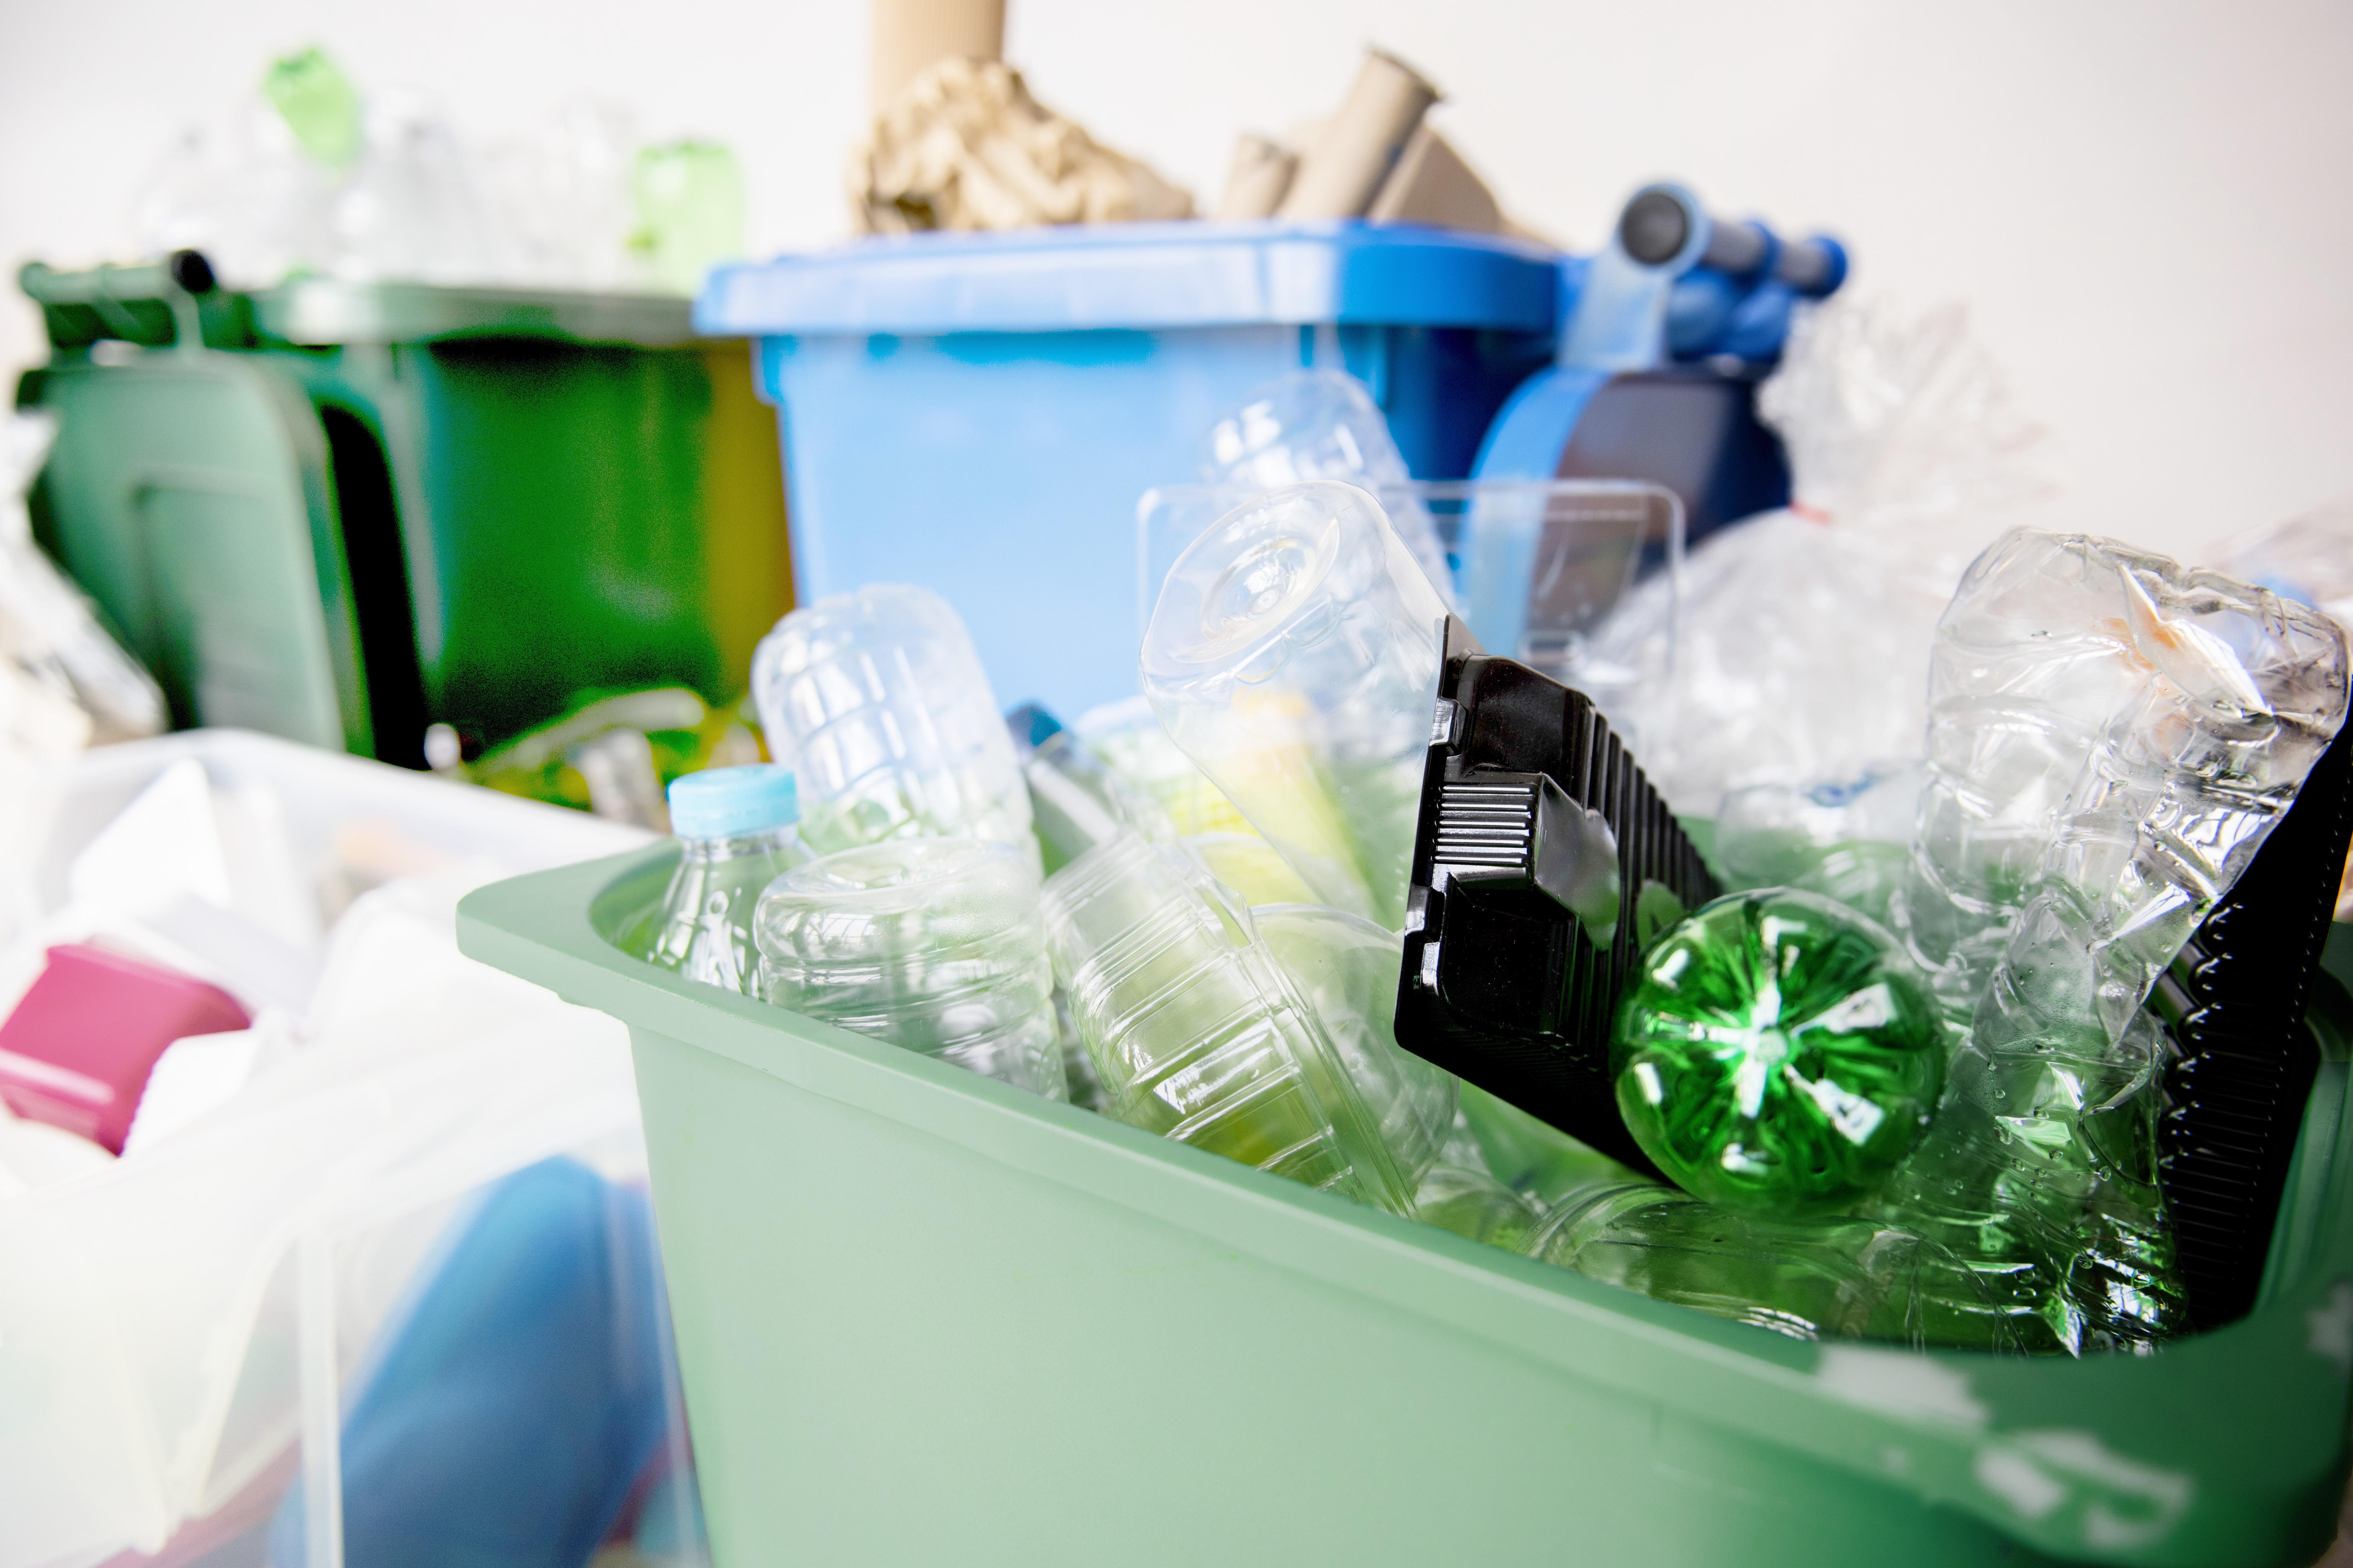 Plastic bottles in recycling bins.